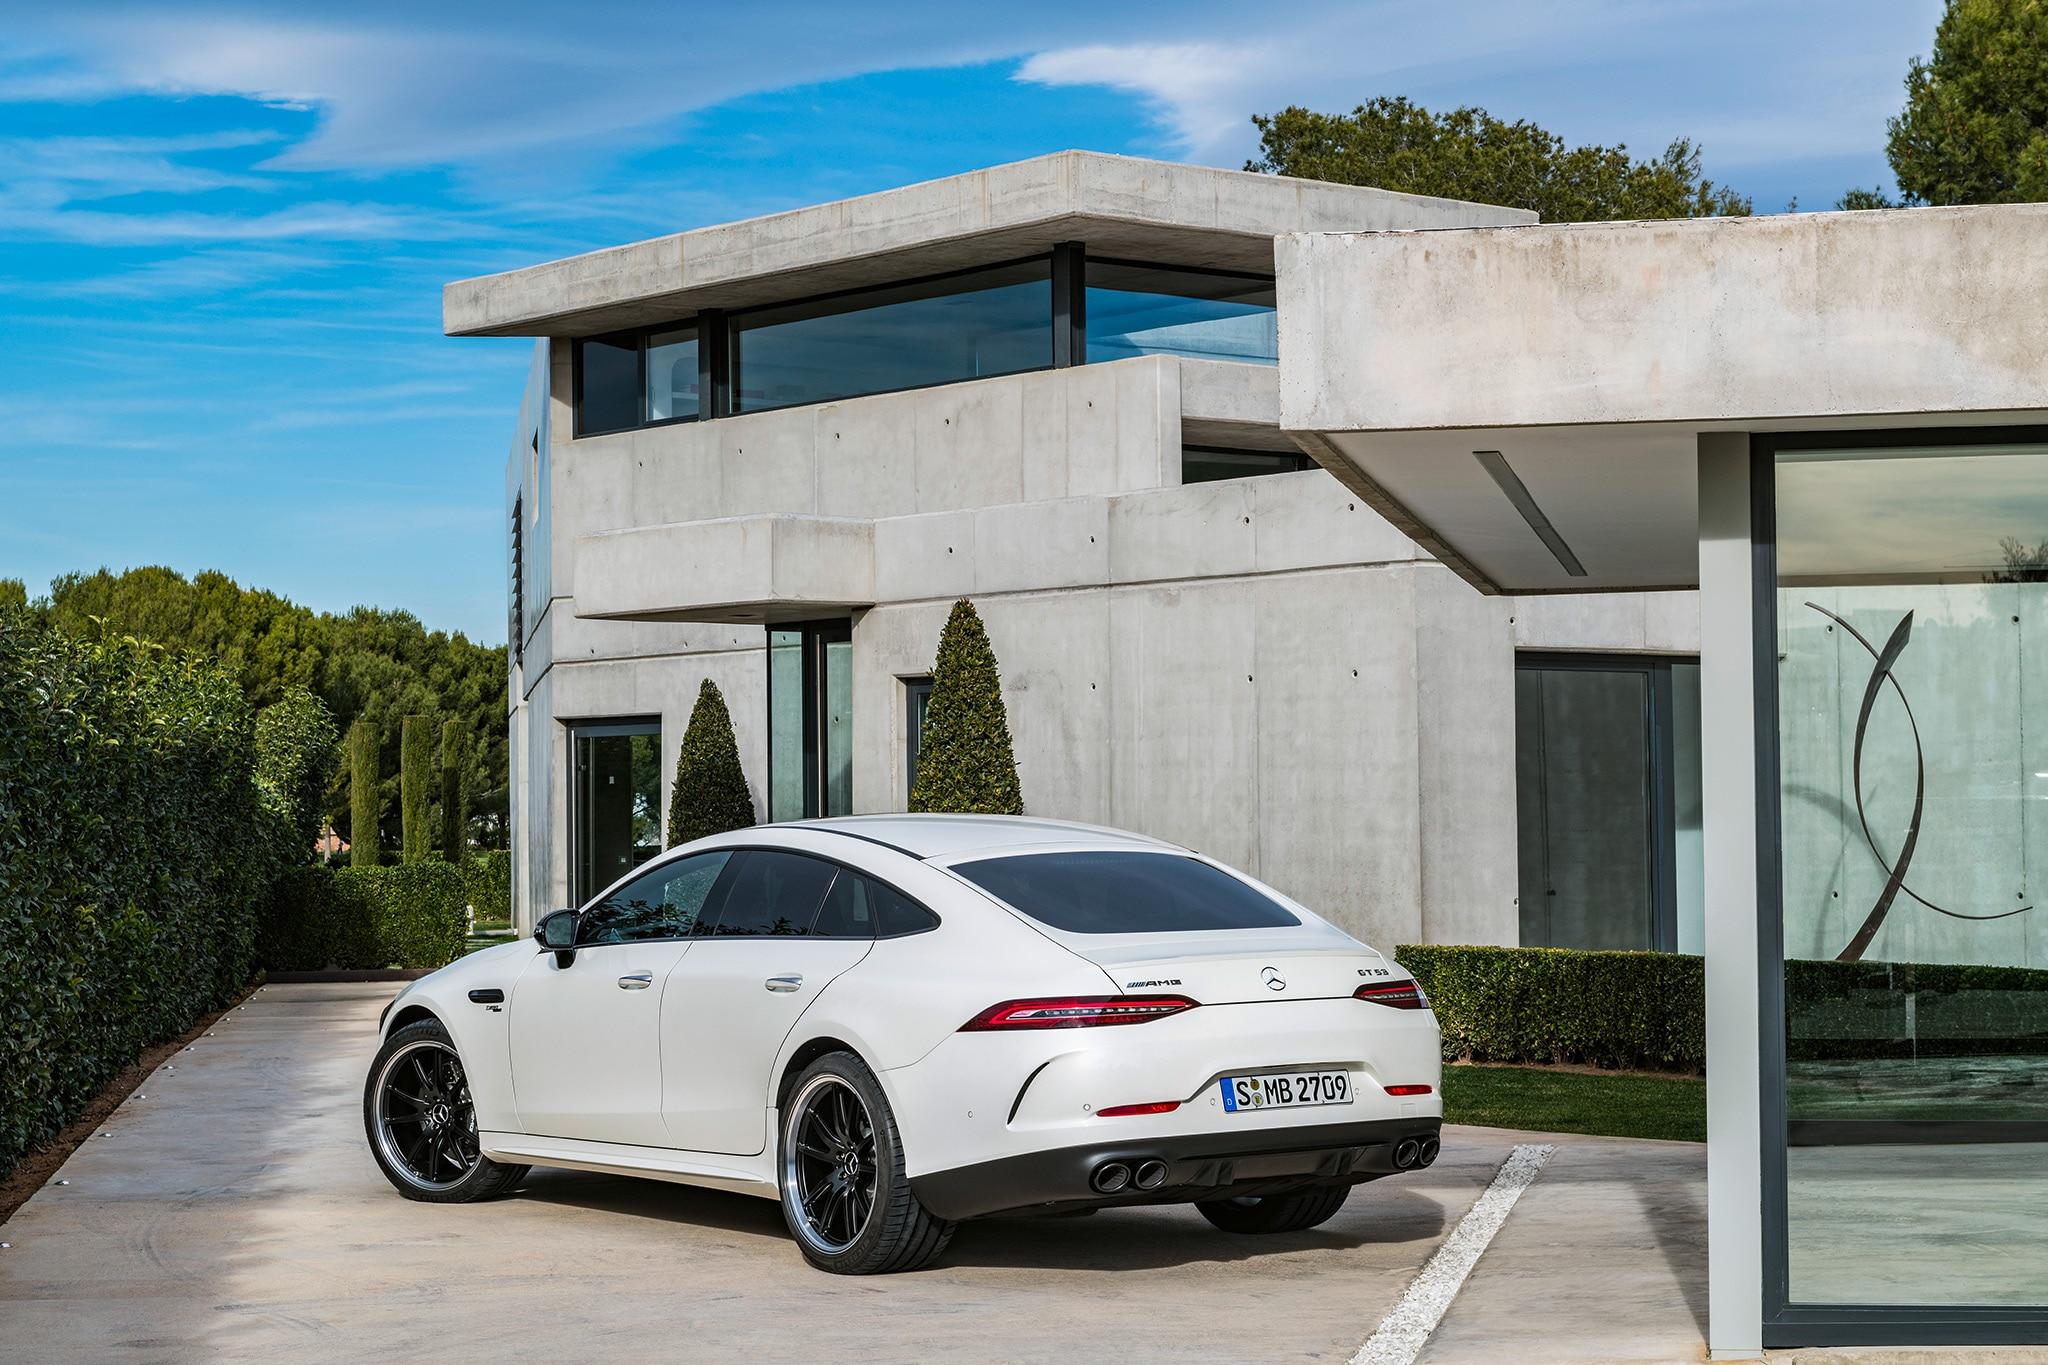 2019 Mercedes Amg Gt 4 Door Coupe Arrives At Last Automobile Magazine